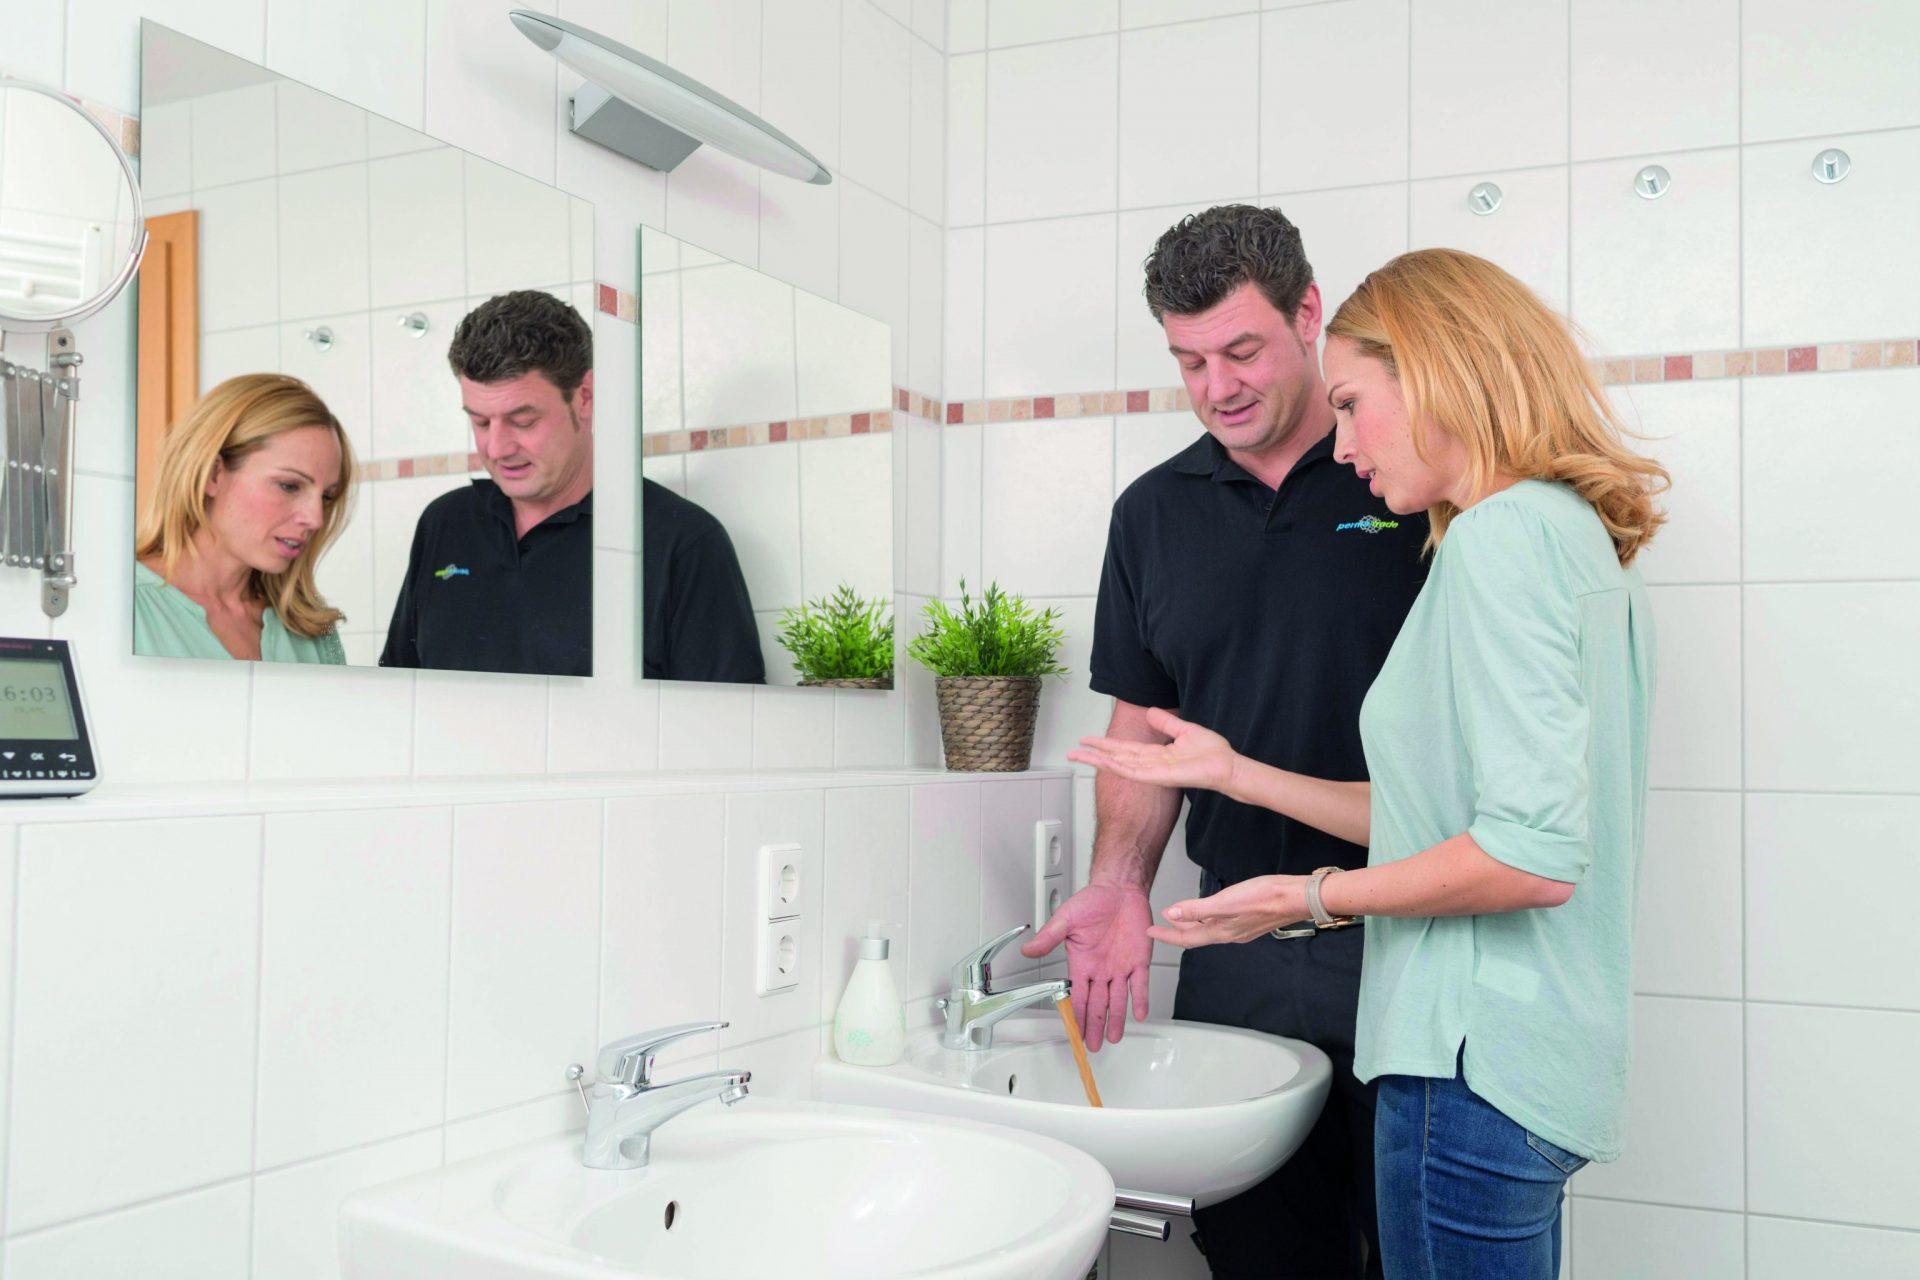 badezimmer 1920, rost badezimmer - perma-trade wassertechnik gmbh, Badezimmer